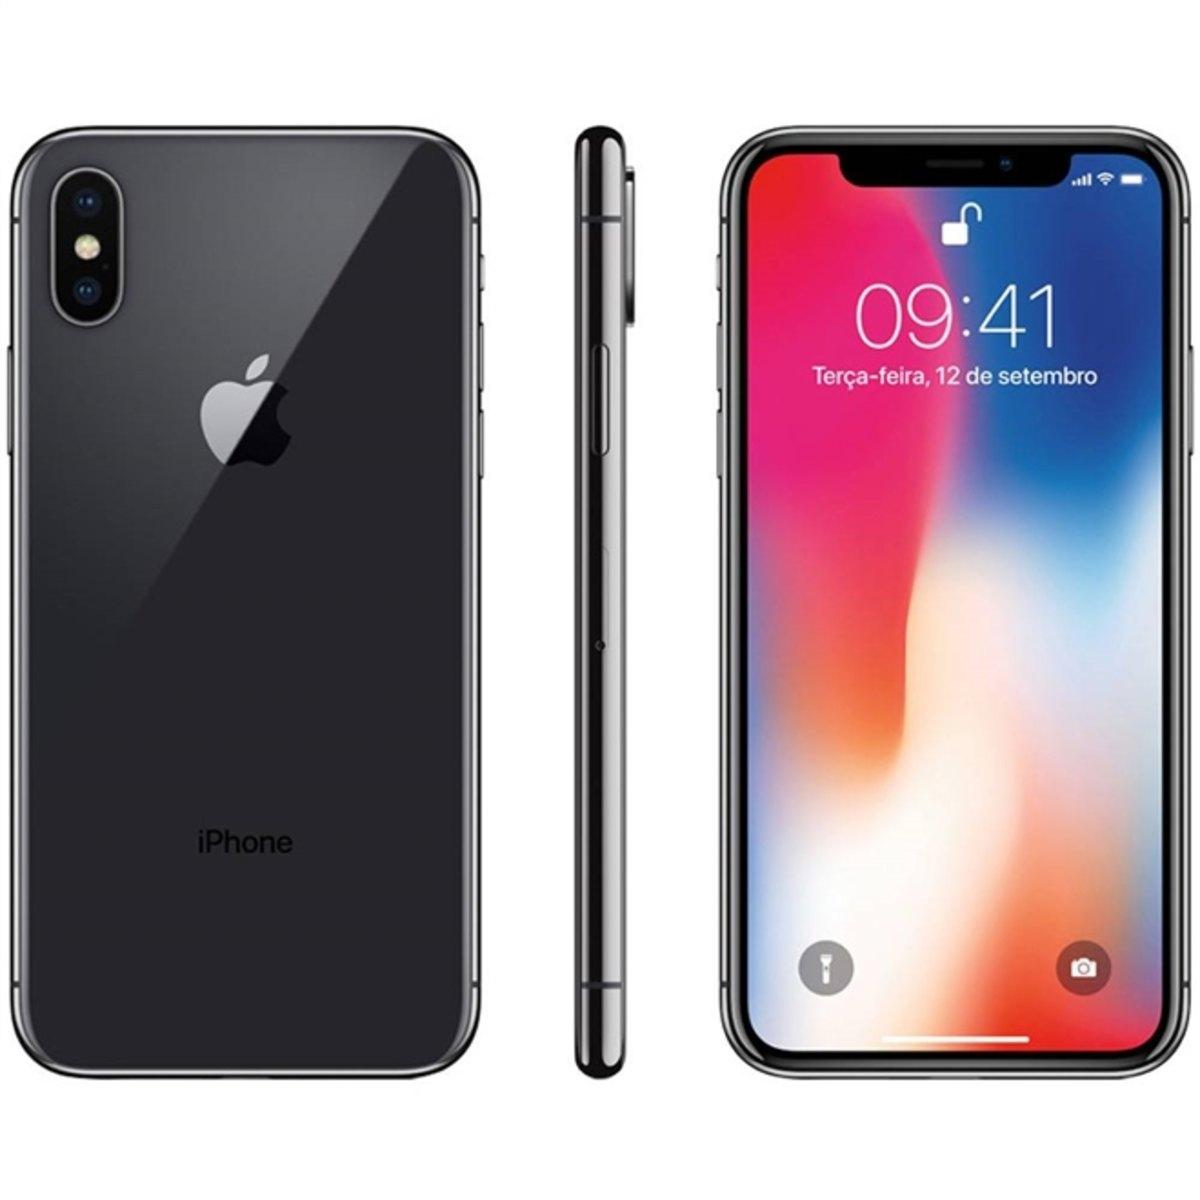 Iphone X Cinza Espacial 256gb Tela 5.8' Ios 11 4g Wi-fi Câmera 12mp - Apple